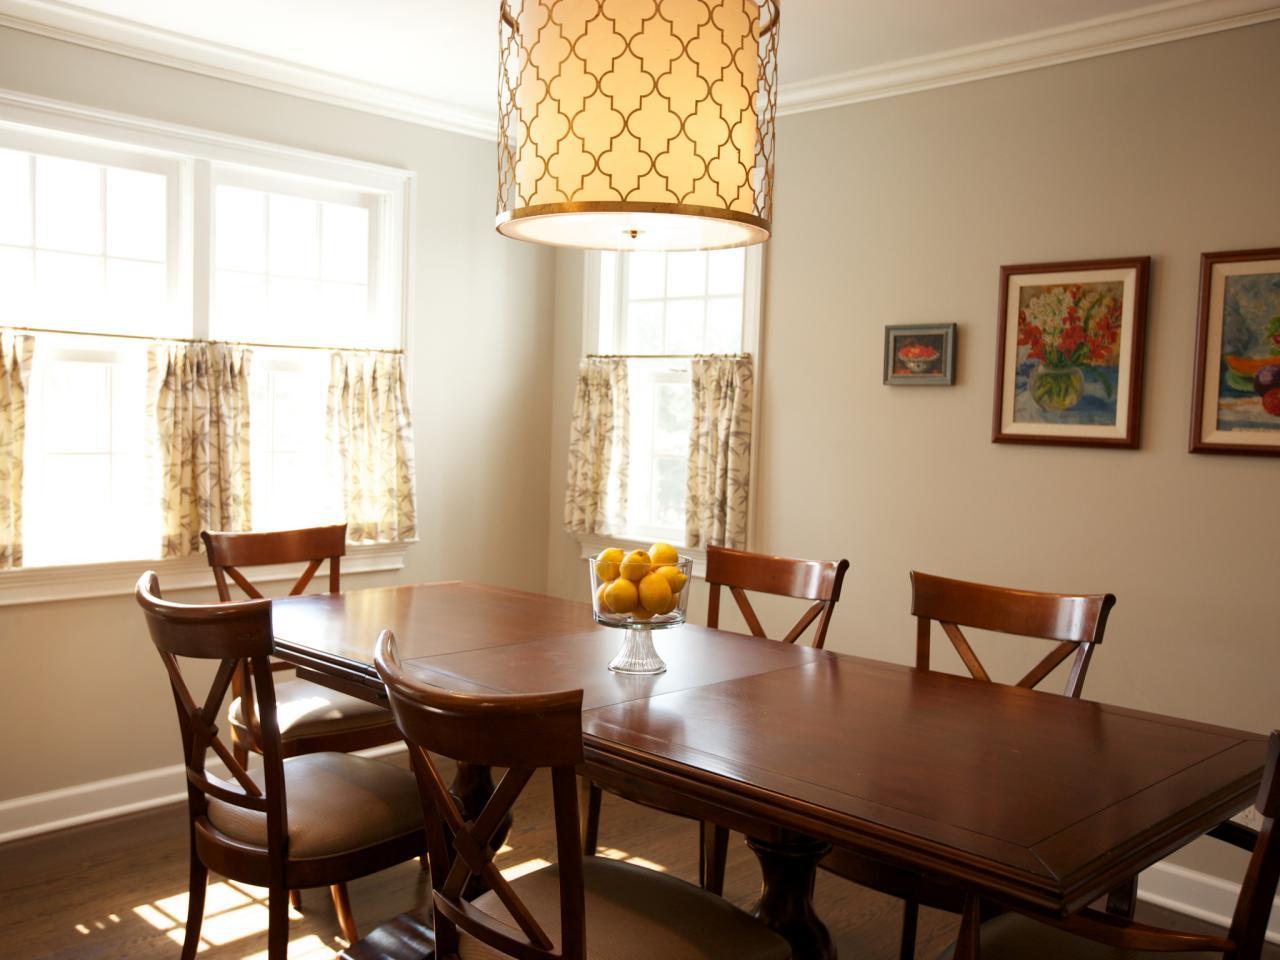 light, bright transitional home makeover | blanche garcia | hgtv